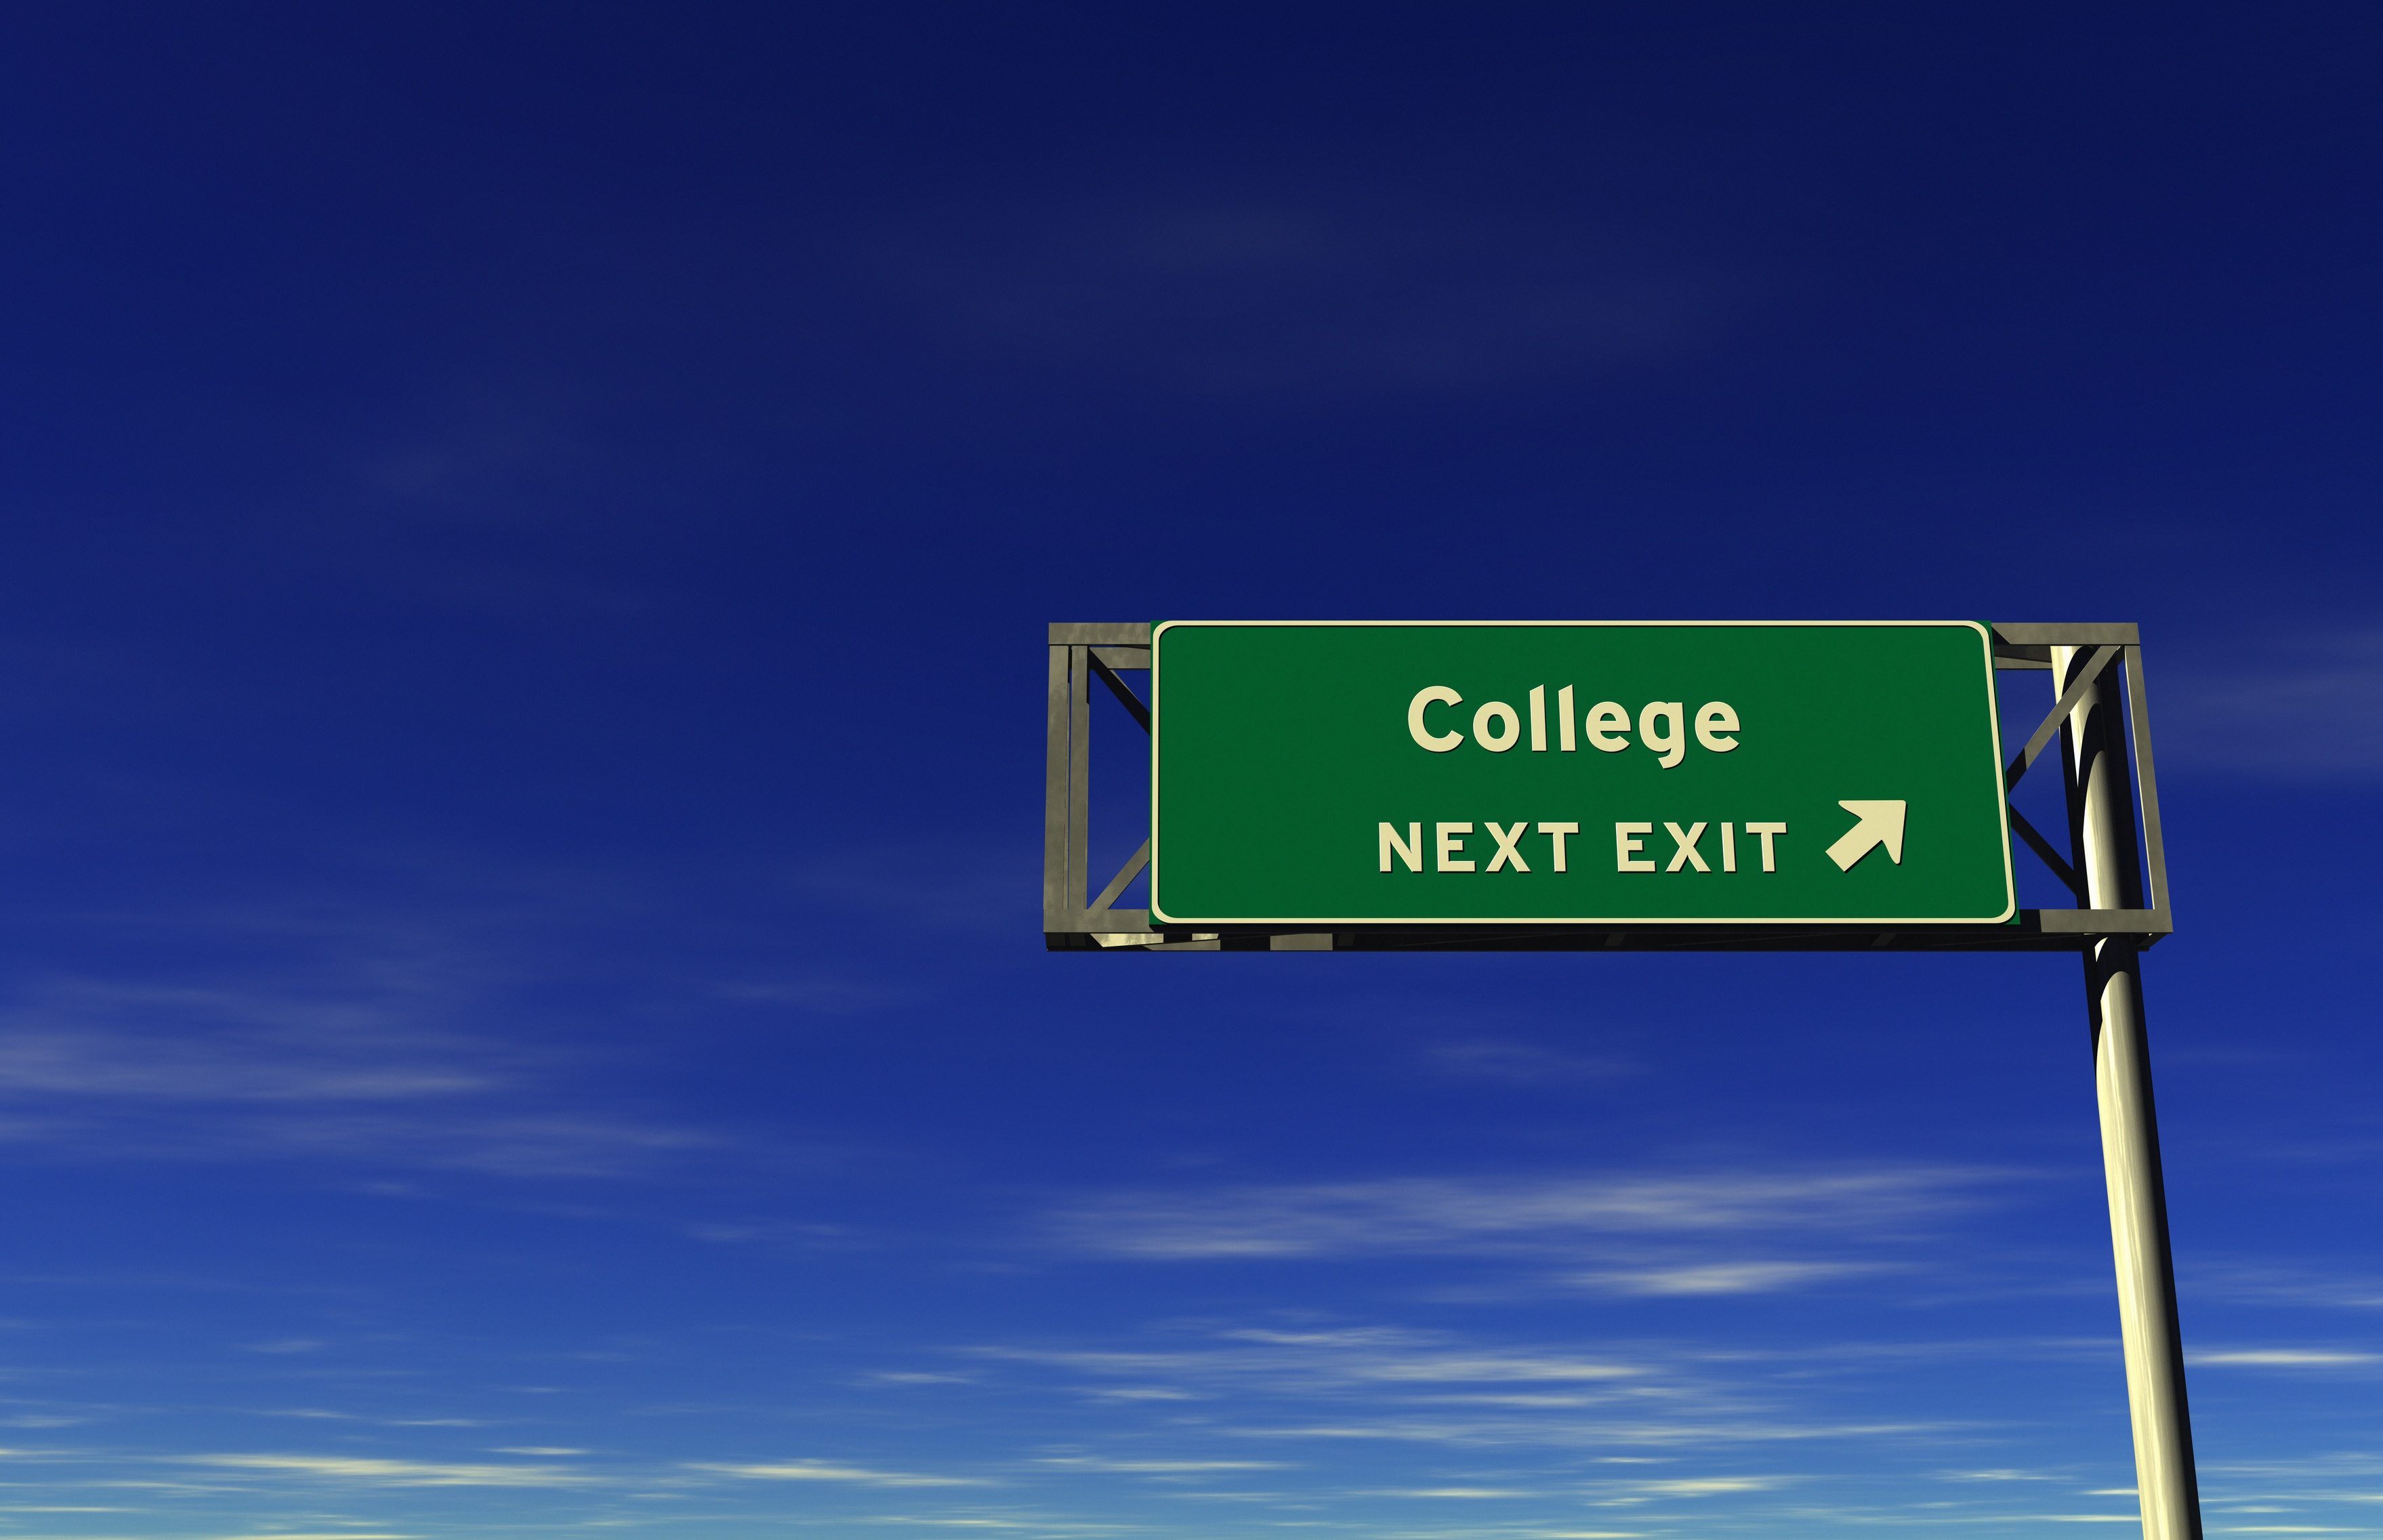 College-Next-Exit.jpg